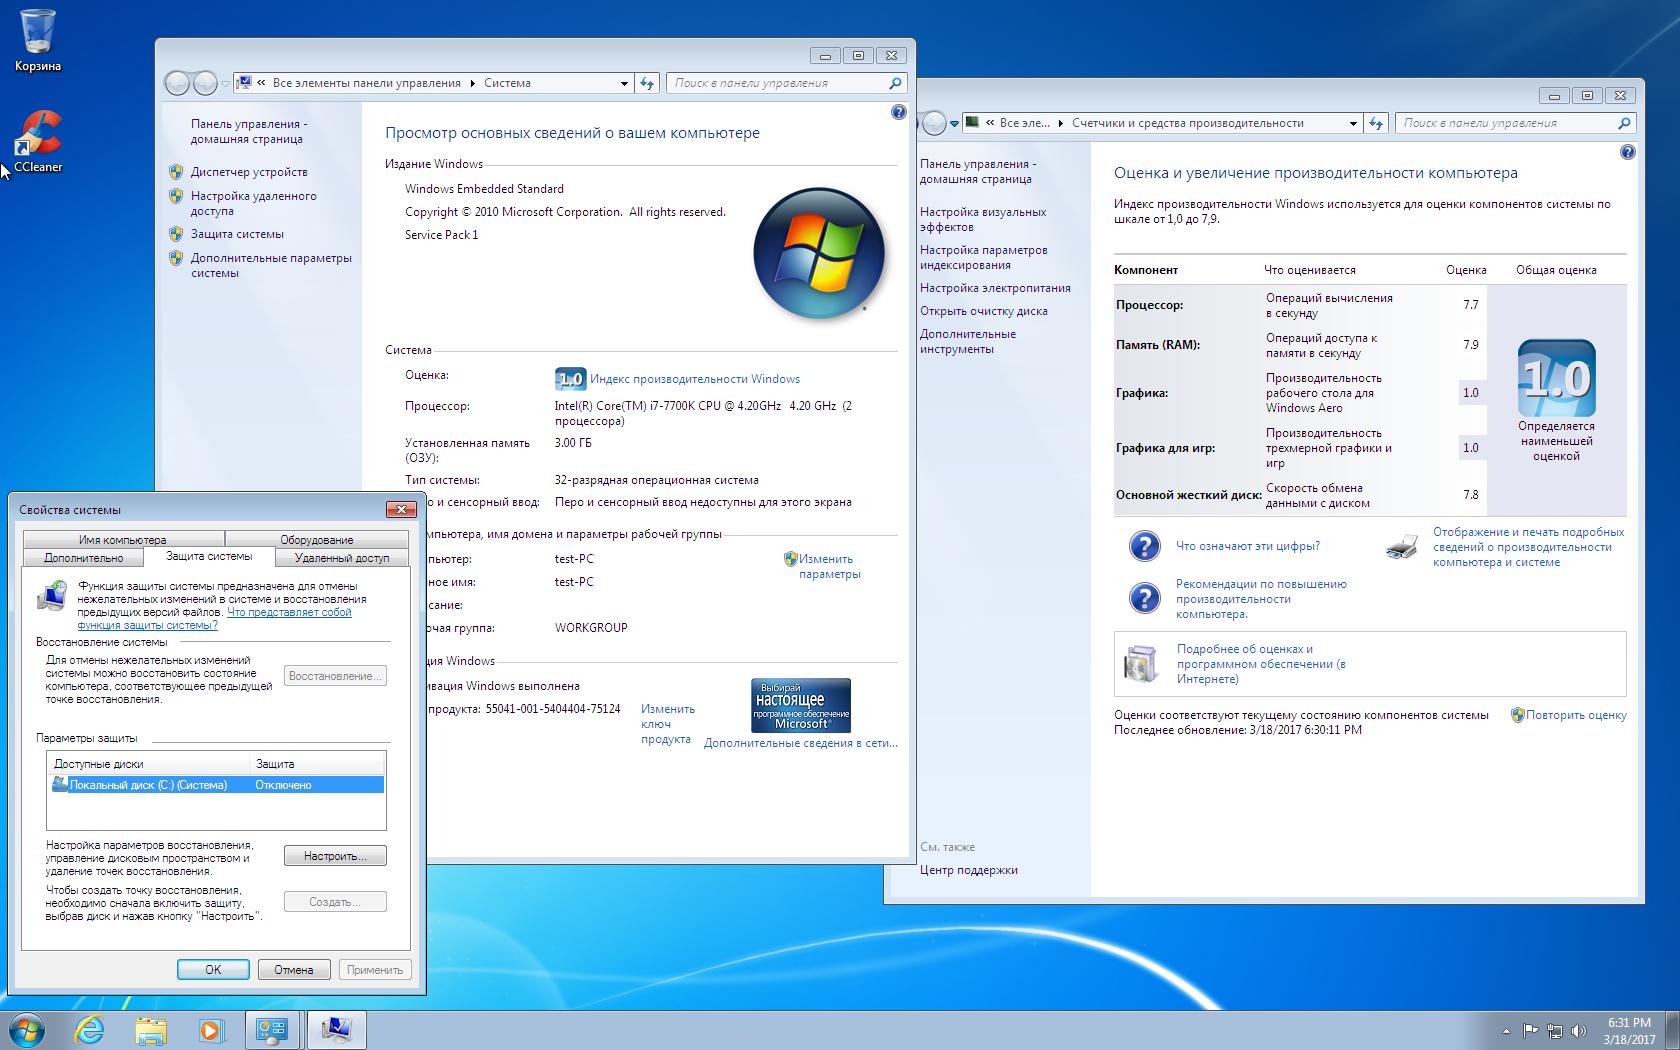 windows 7 sp1 64 bits español iso utorrent